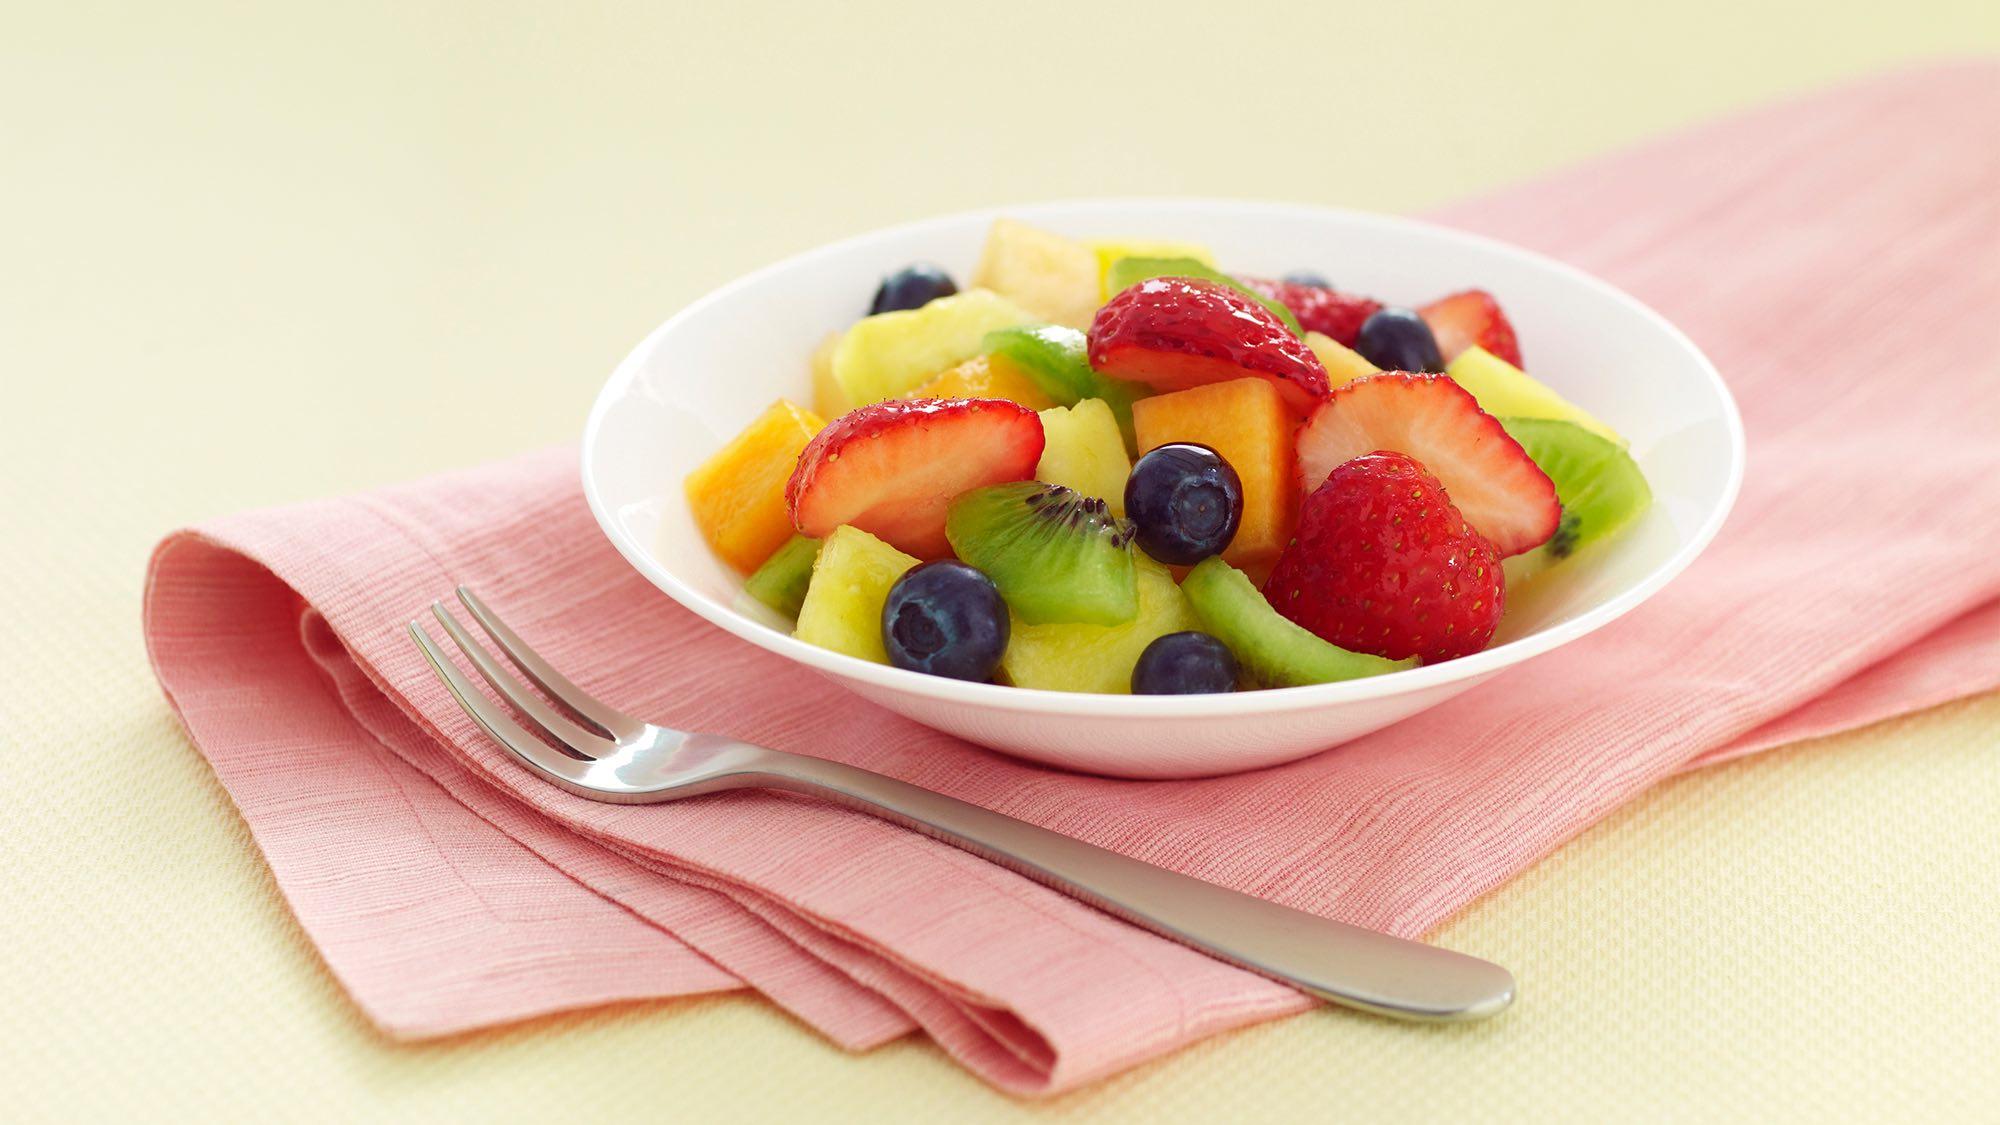 McCormick Fruit Salad